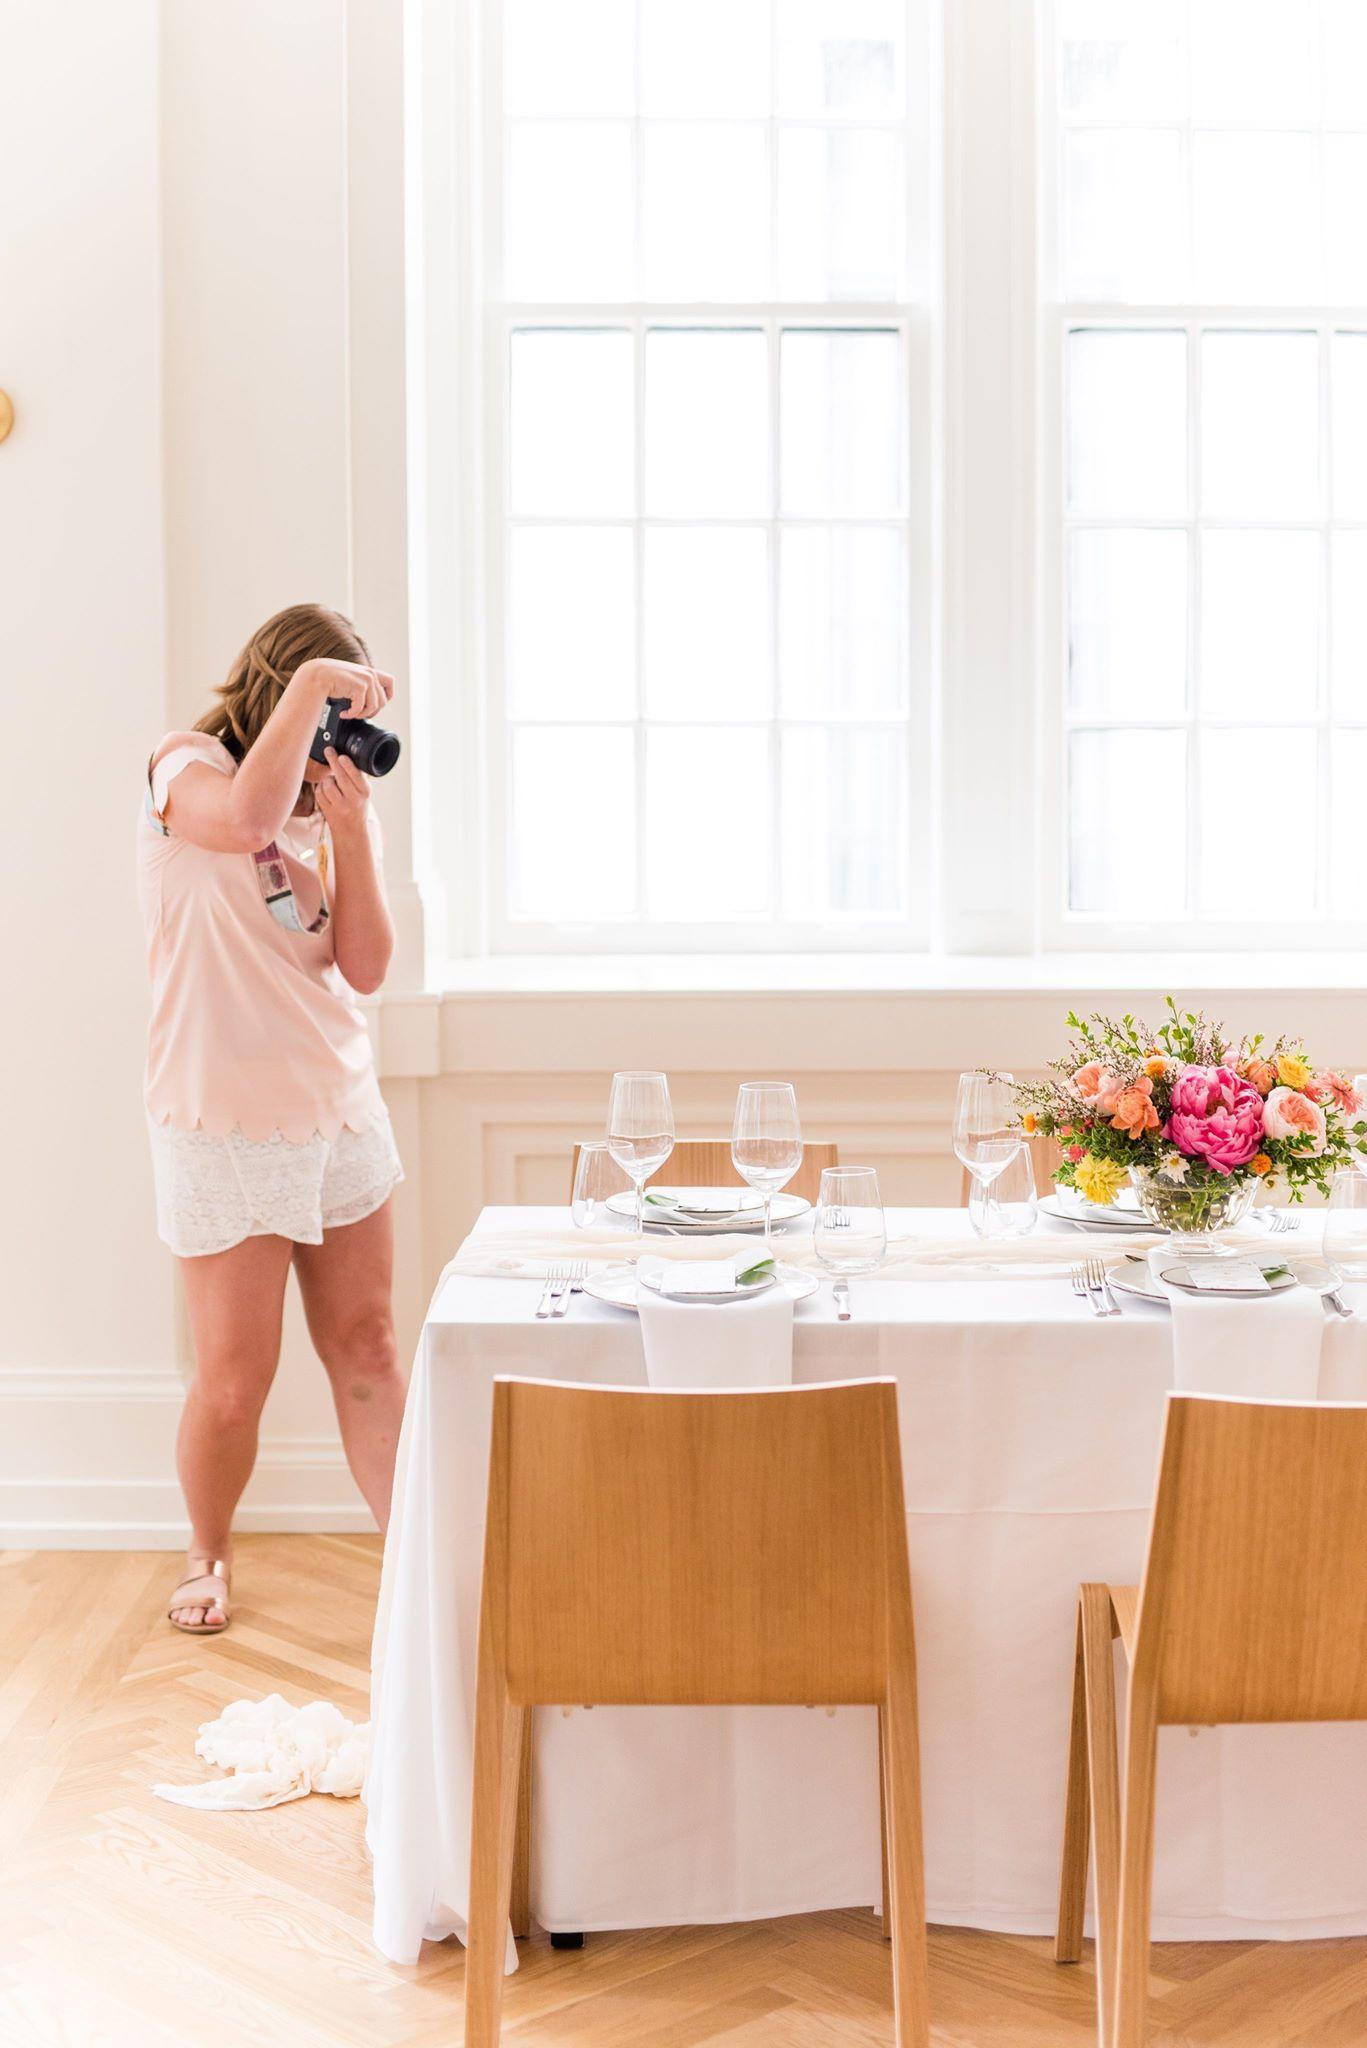 Graphic Design, Vanessa Jordan Photography, Destination Wedding Photographer, Graphic Design Educator, Mentoring Sessions